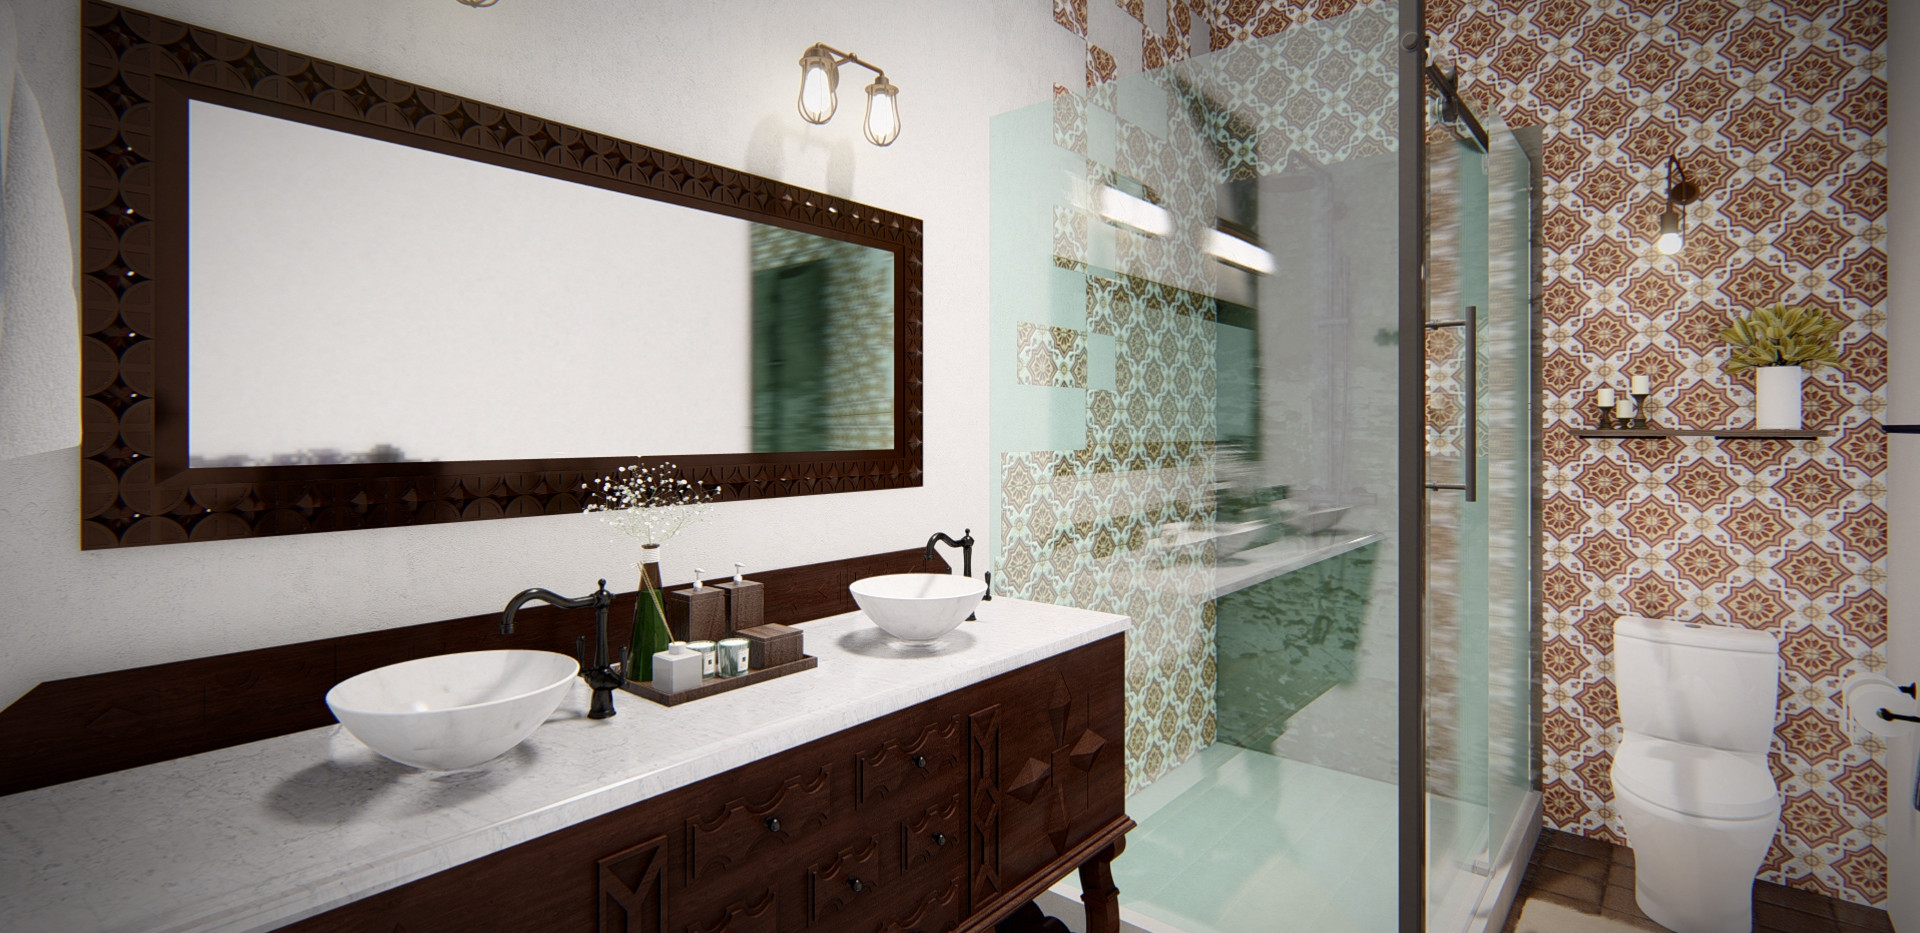 baño_ave_del_paraiso.jpg